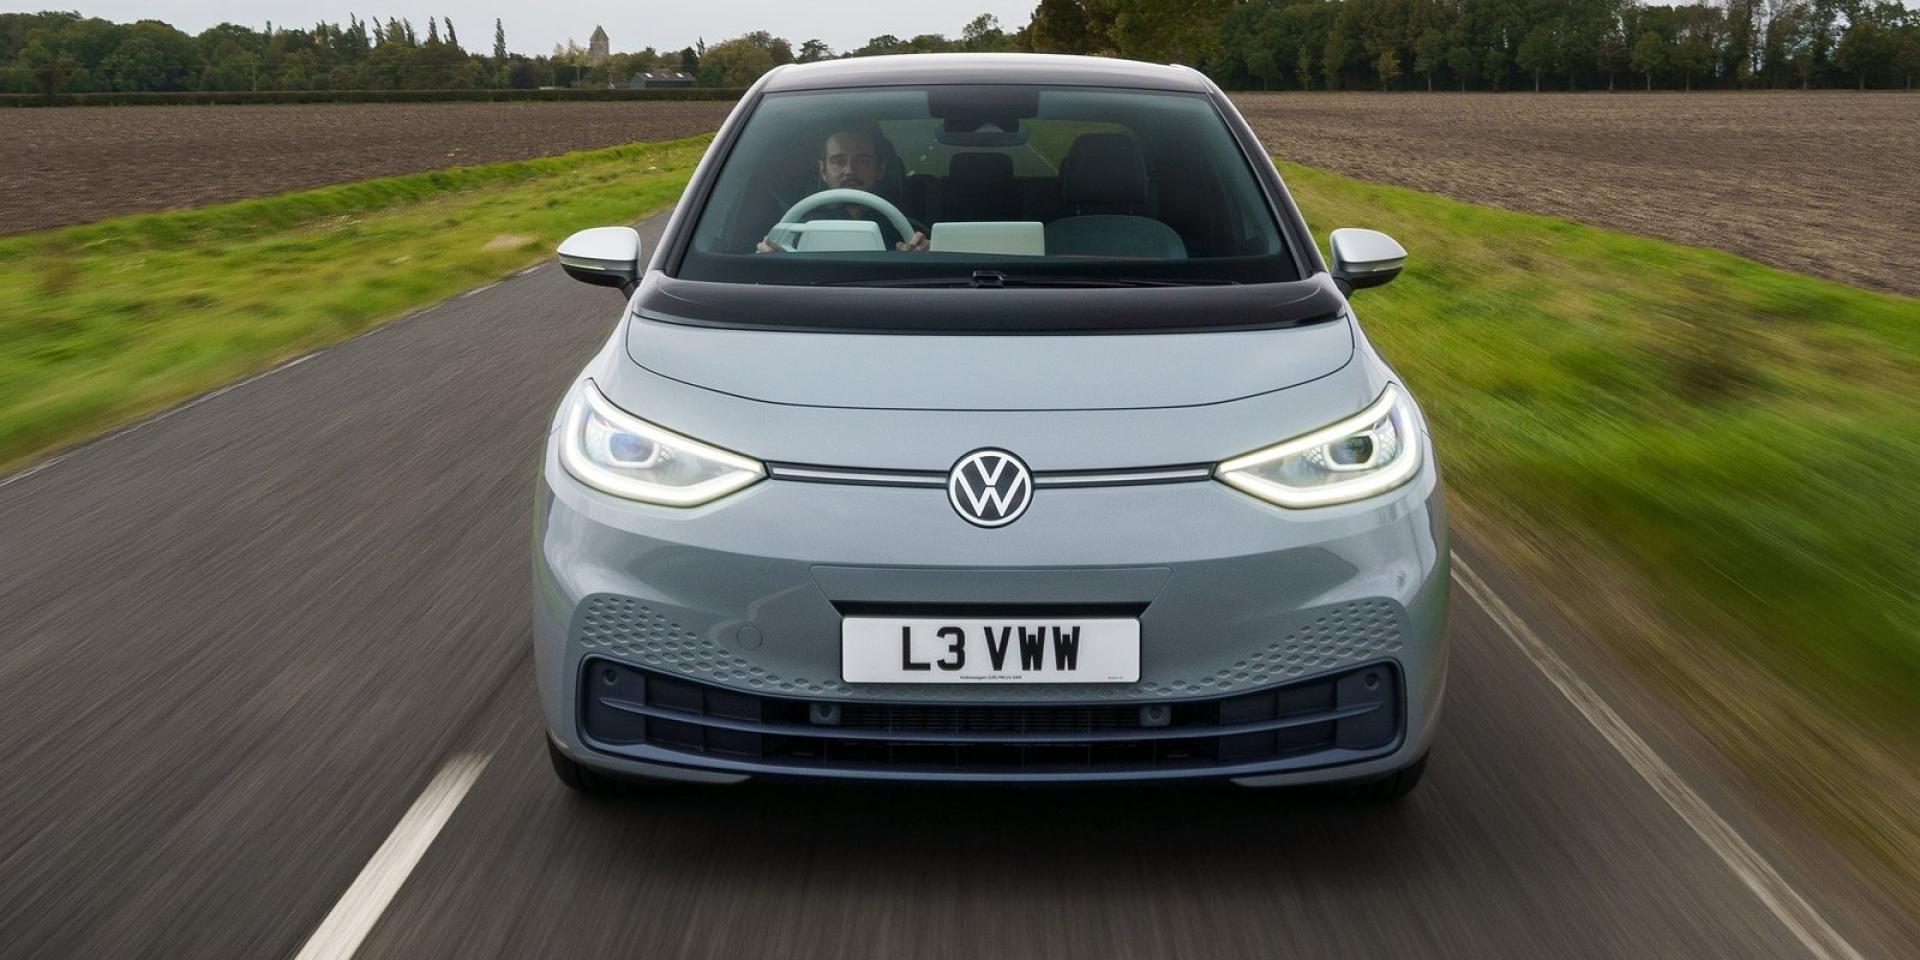 ID.3大敗Model 3!Volkswagen攻佔12月歐洲電動車銷售榜